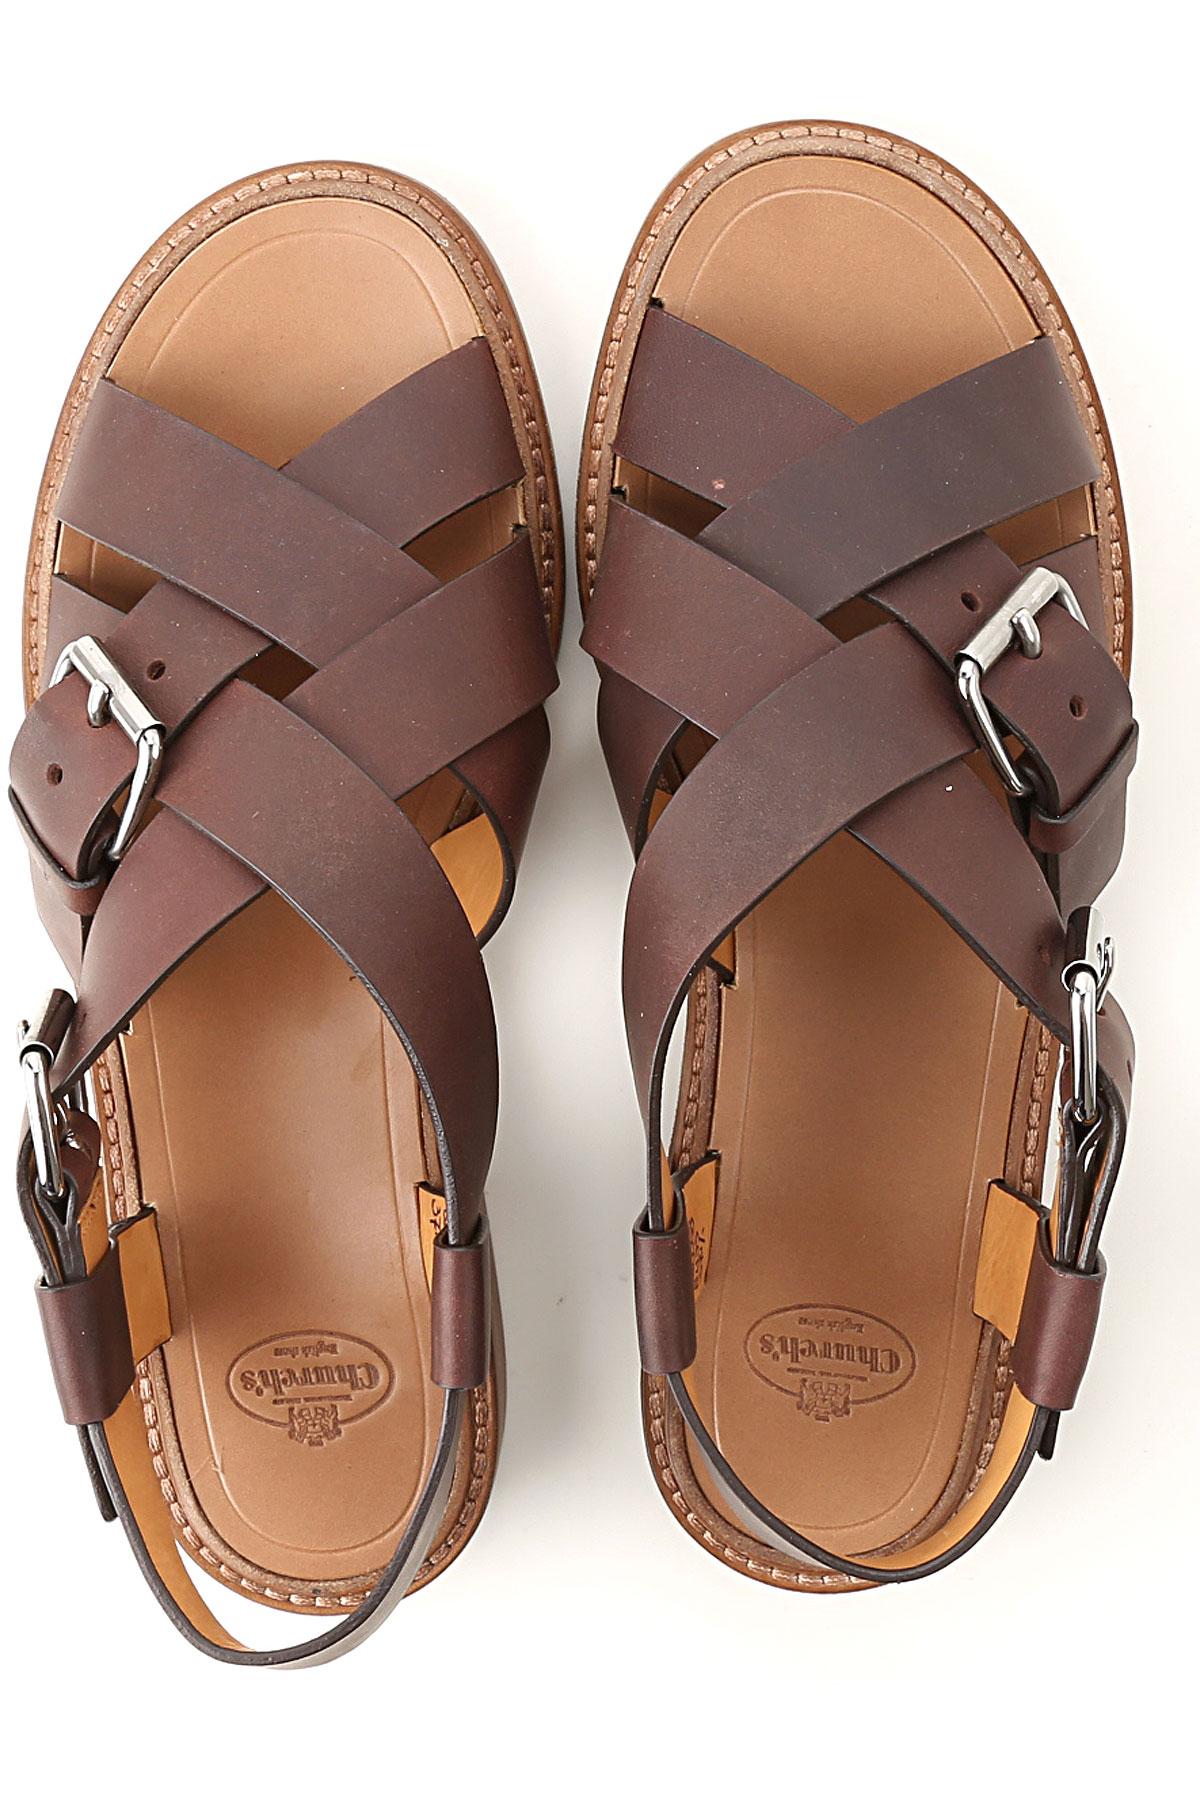 2019 verano Marrón Zapatos Para nbsp; Chocolate Church's Primavera Mujer qOXwwp